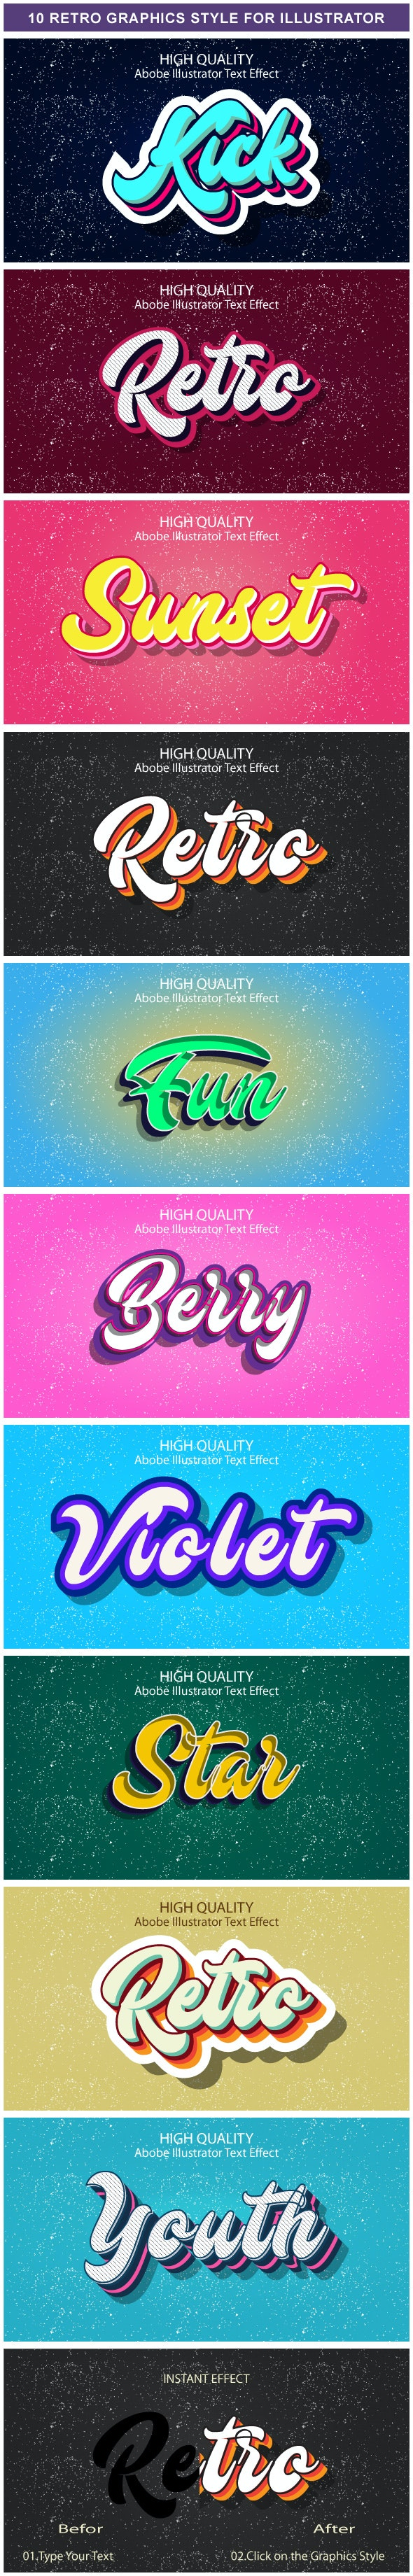 10 Different Retro Graphic Styles for Adobe Illustrator - Styles Illustrator